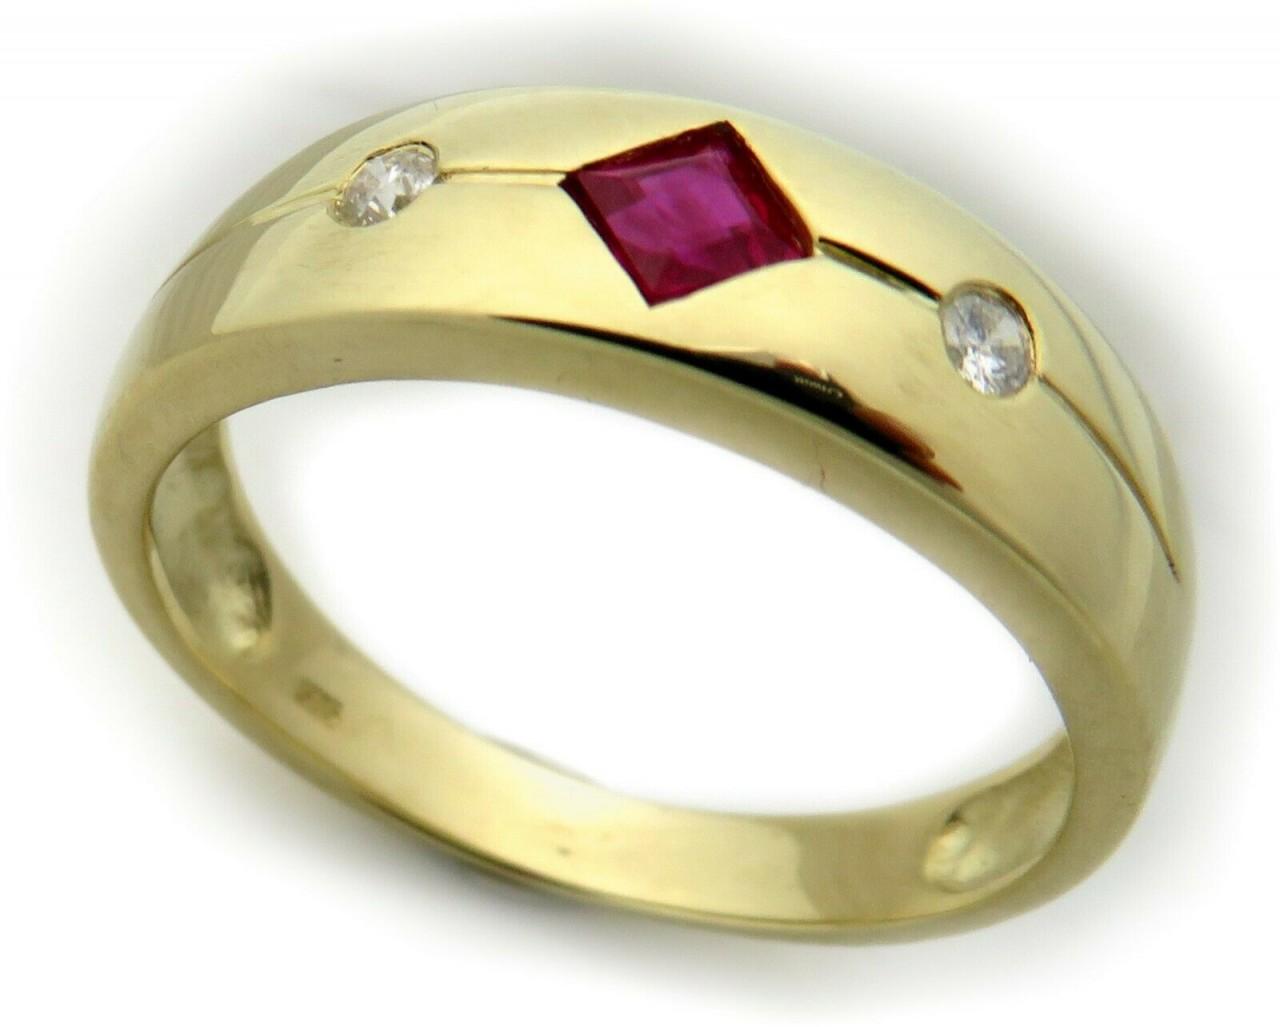 Damen Ring Rubin m. Diamant 0,04ct echt Gold 585 14 karat Gelbgold Brillant Neu